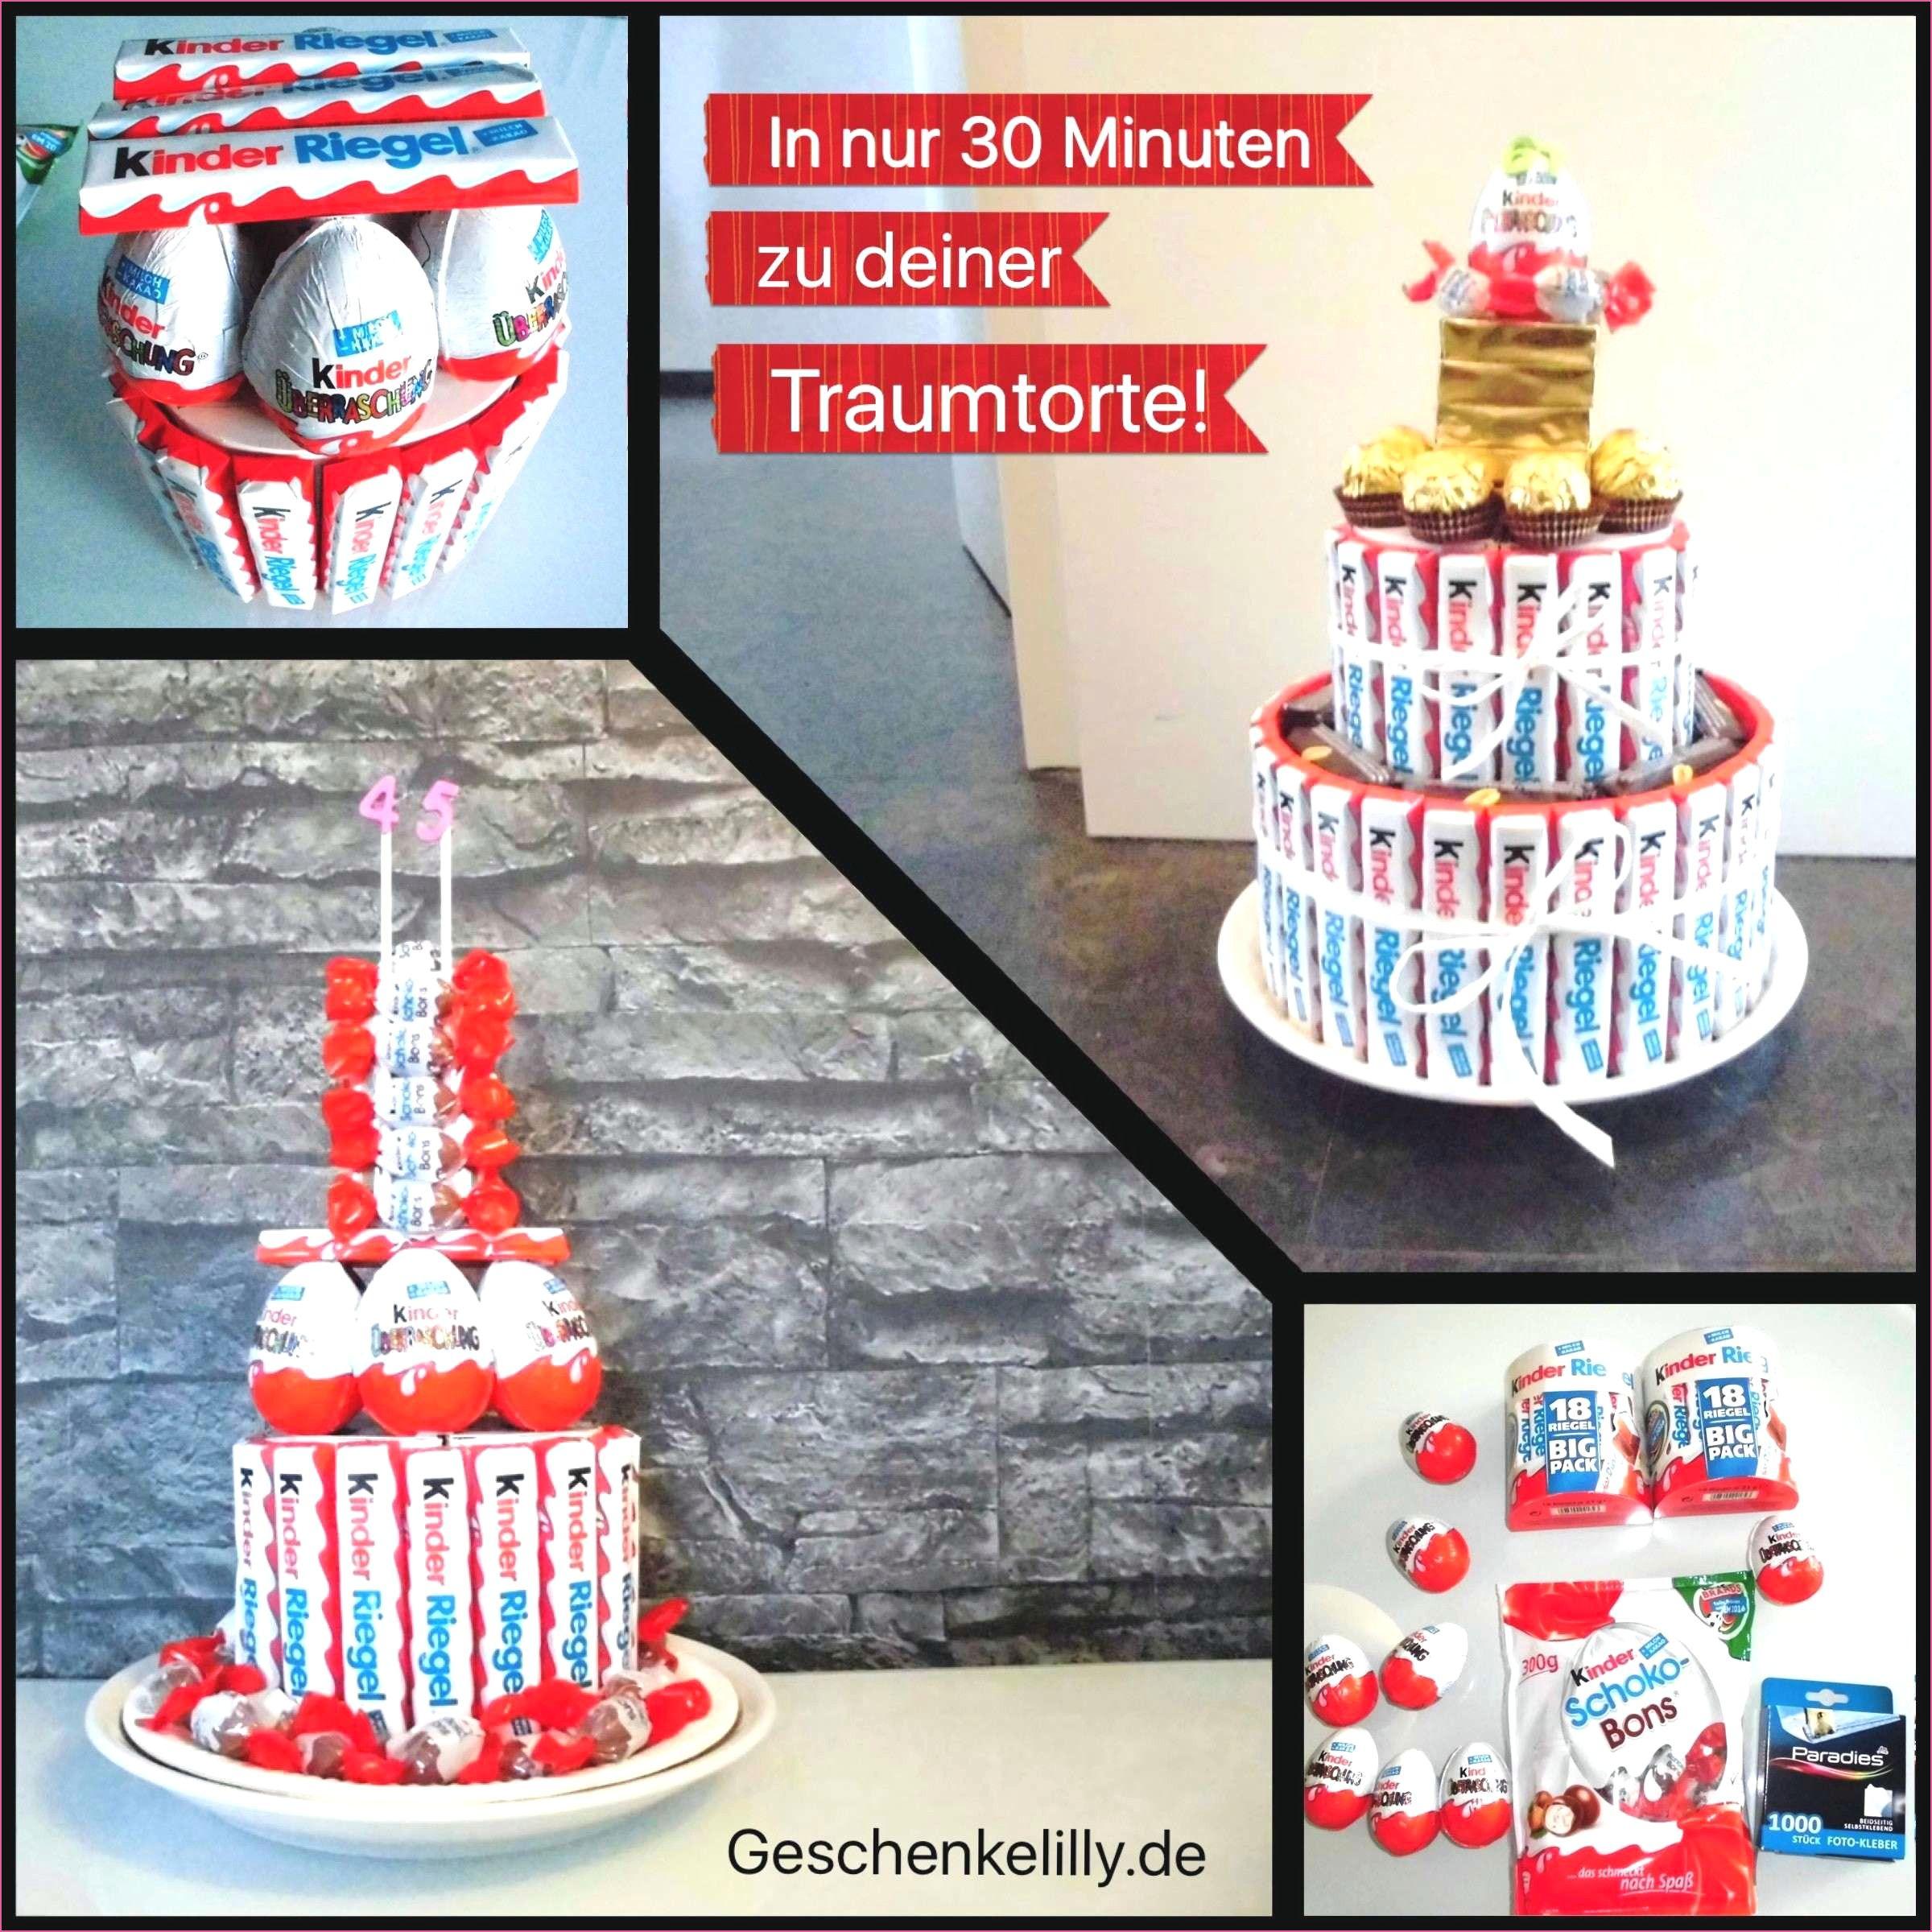 Geschenk 60 Geburtstag Frau In 2020 Kinder Riegel Geburtstag